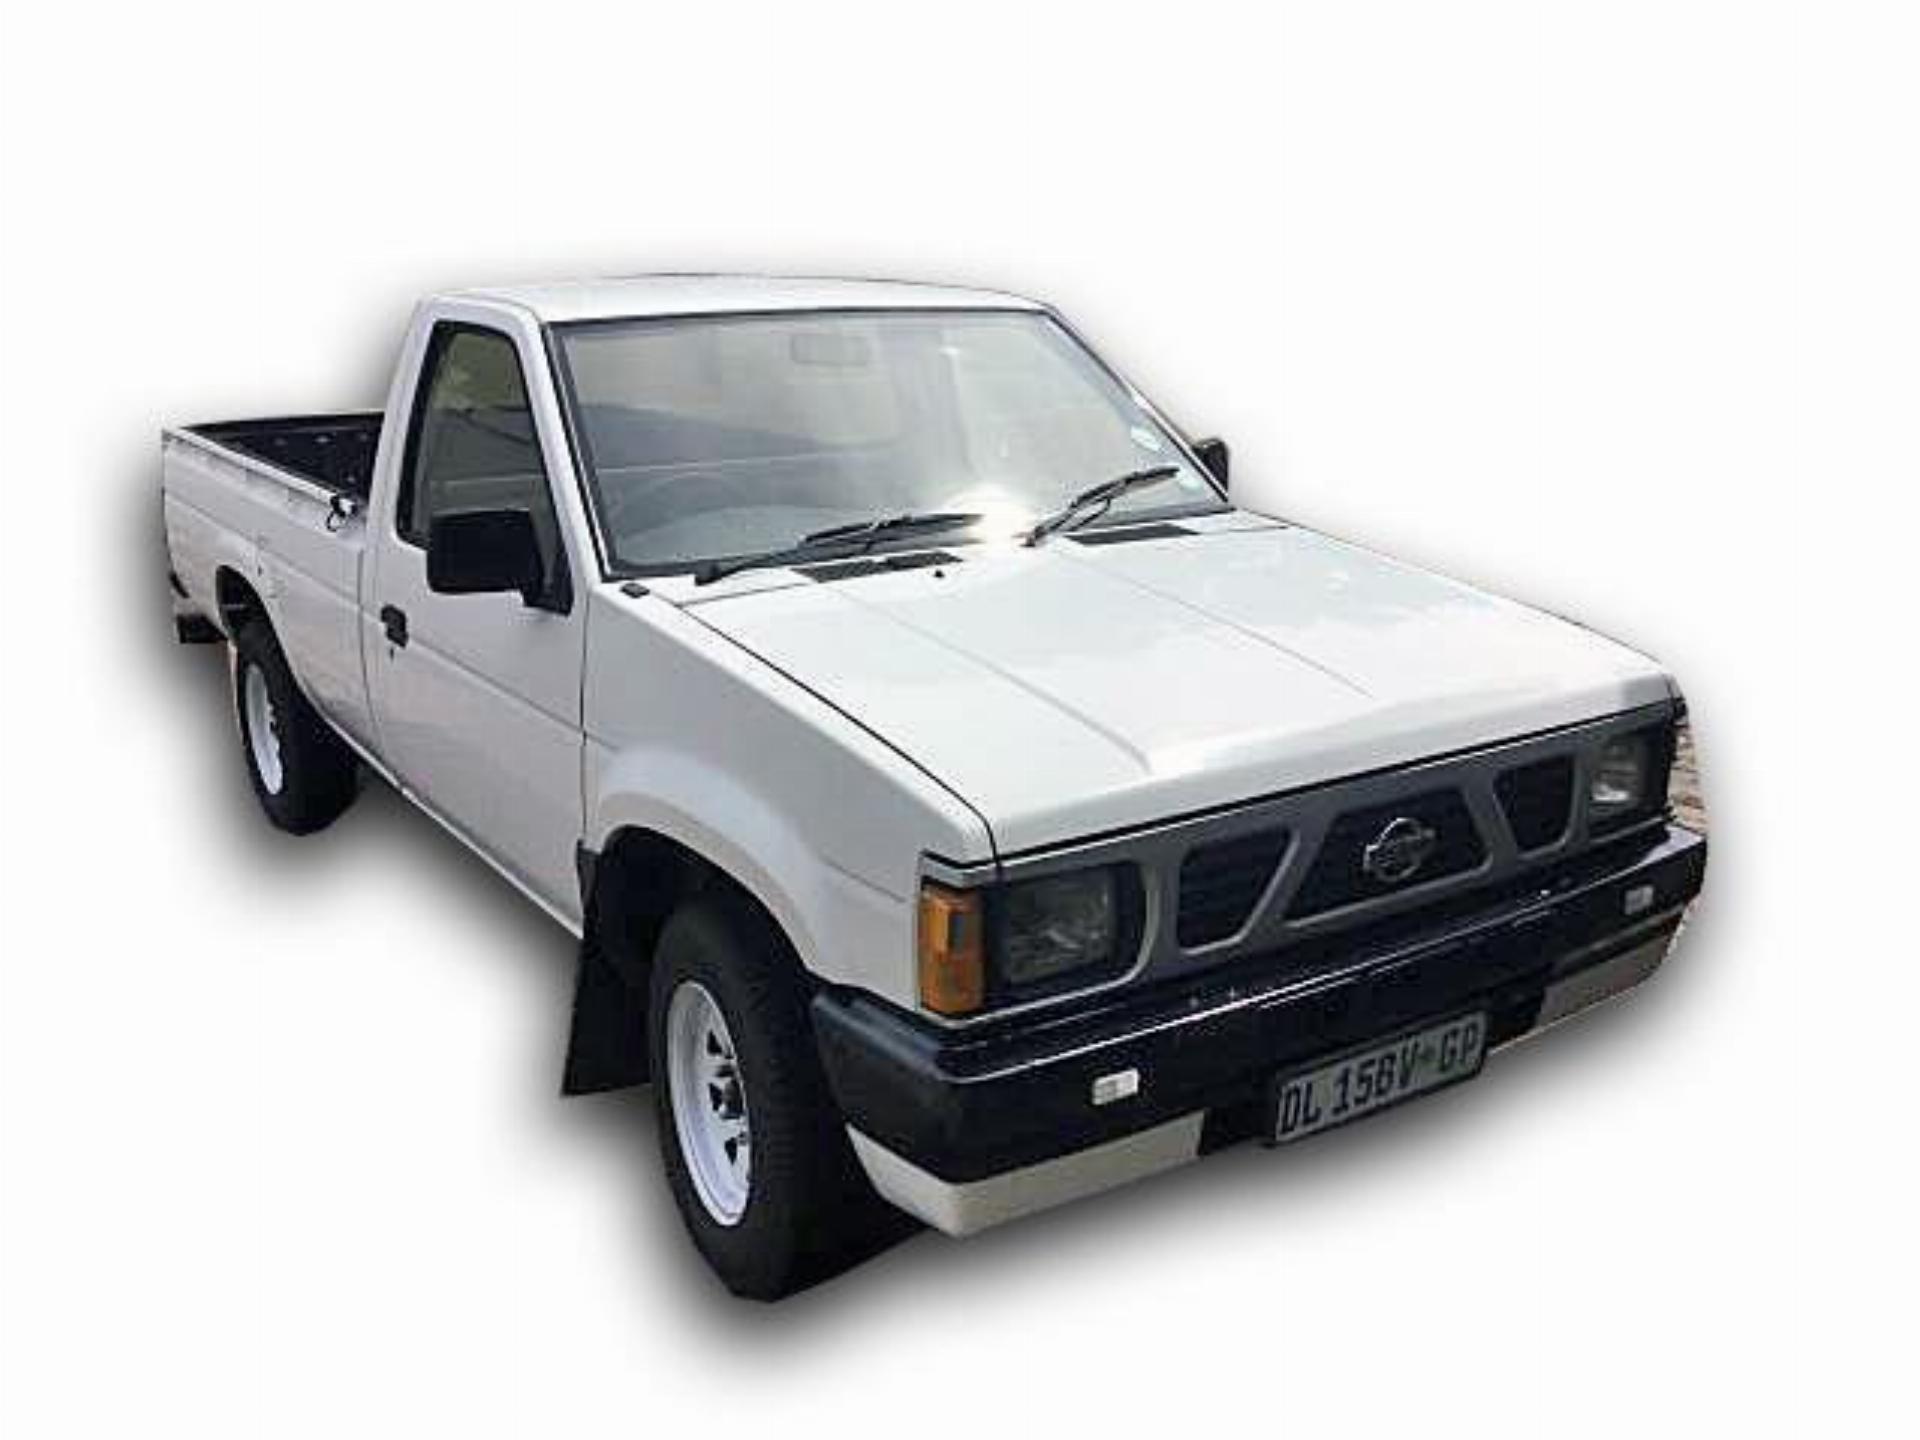 Nissan Hardbody 2.0 LWB